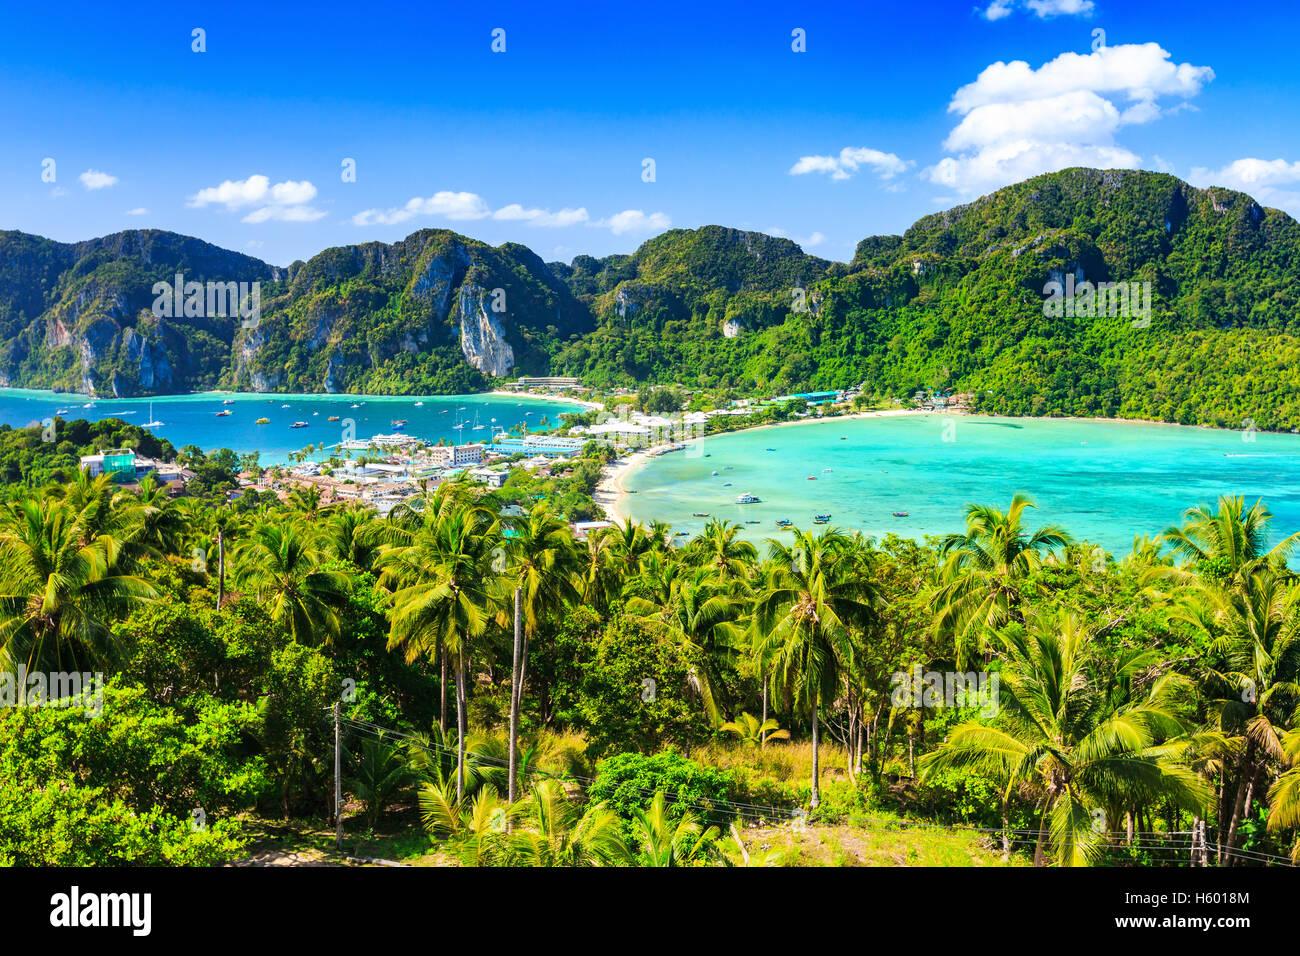 Thailandia, Phi Phi Don island, provincia di Krabi. Immagini Stock